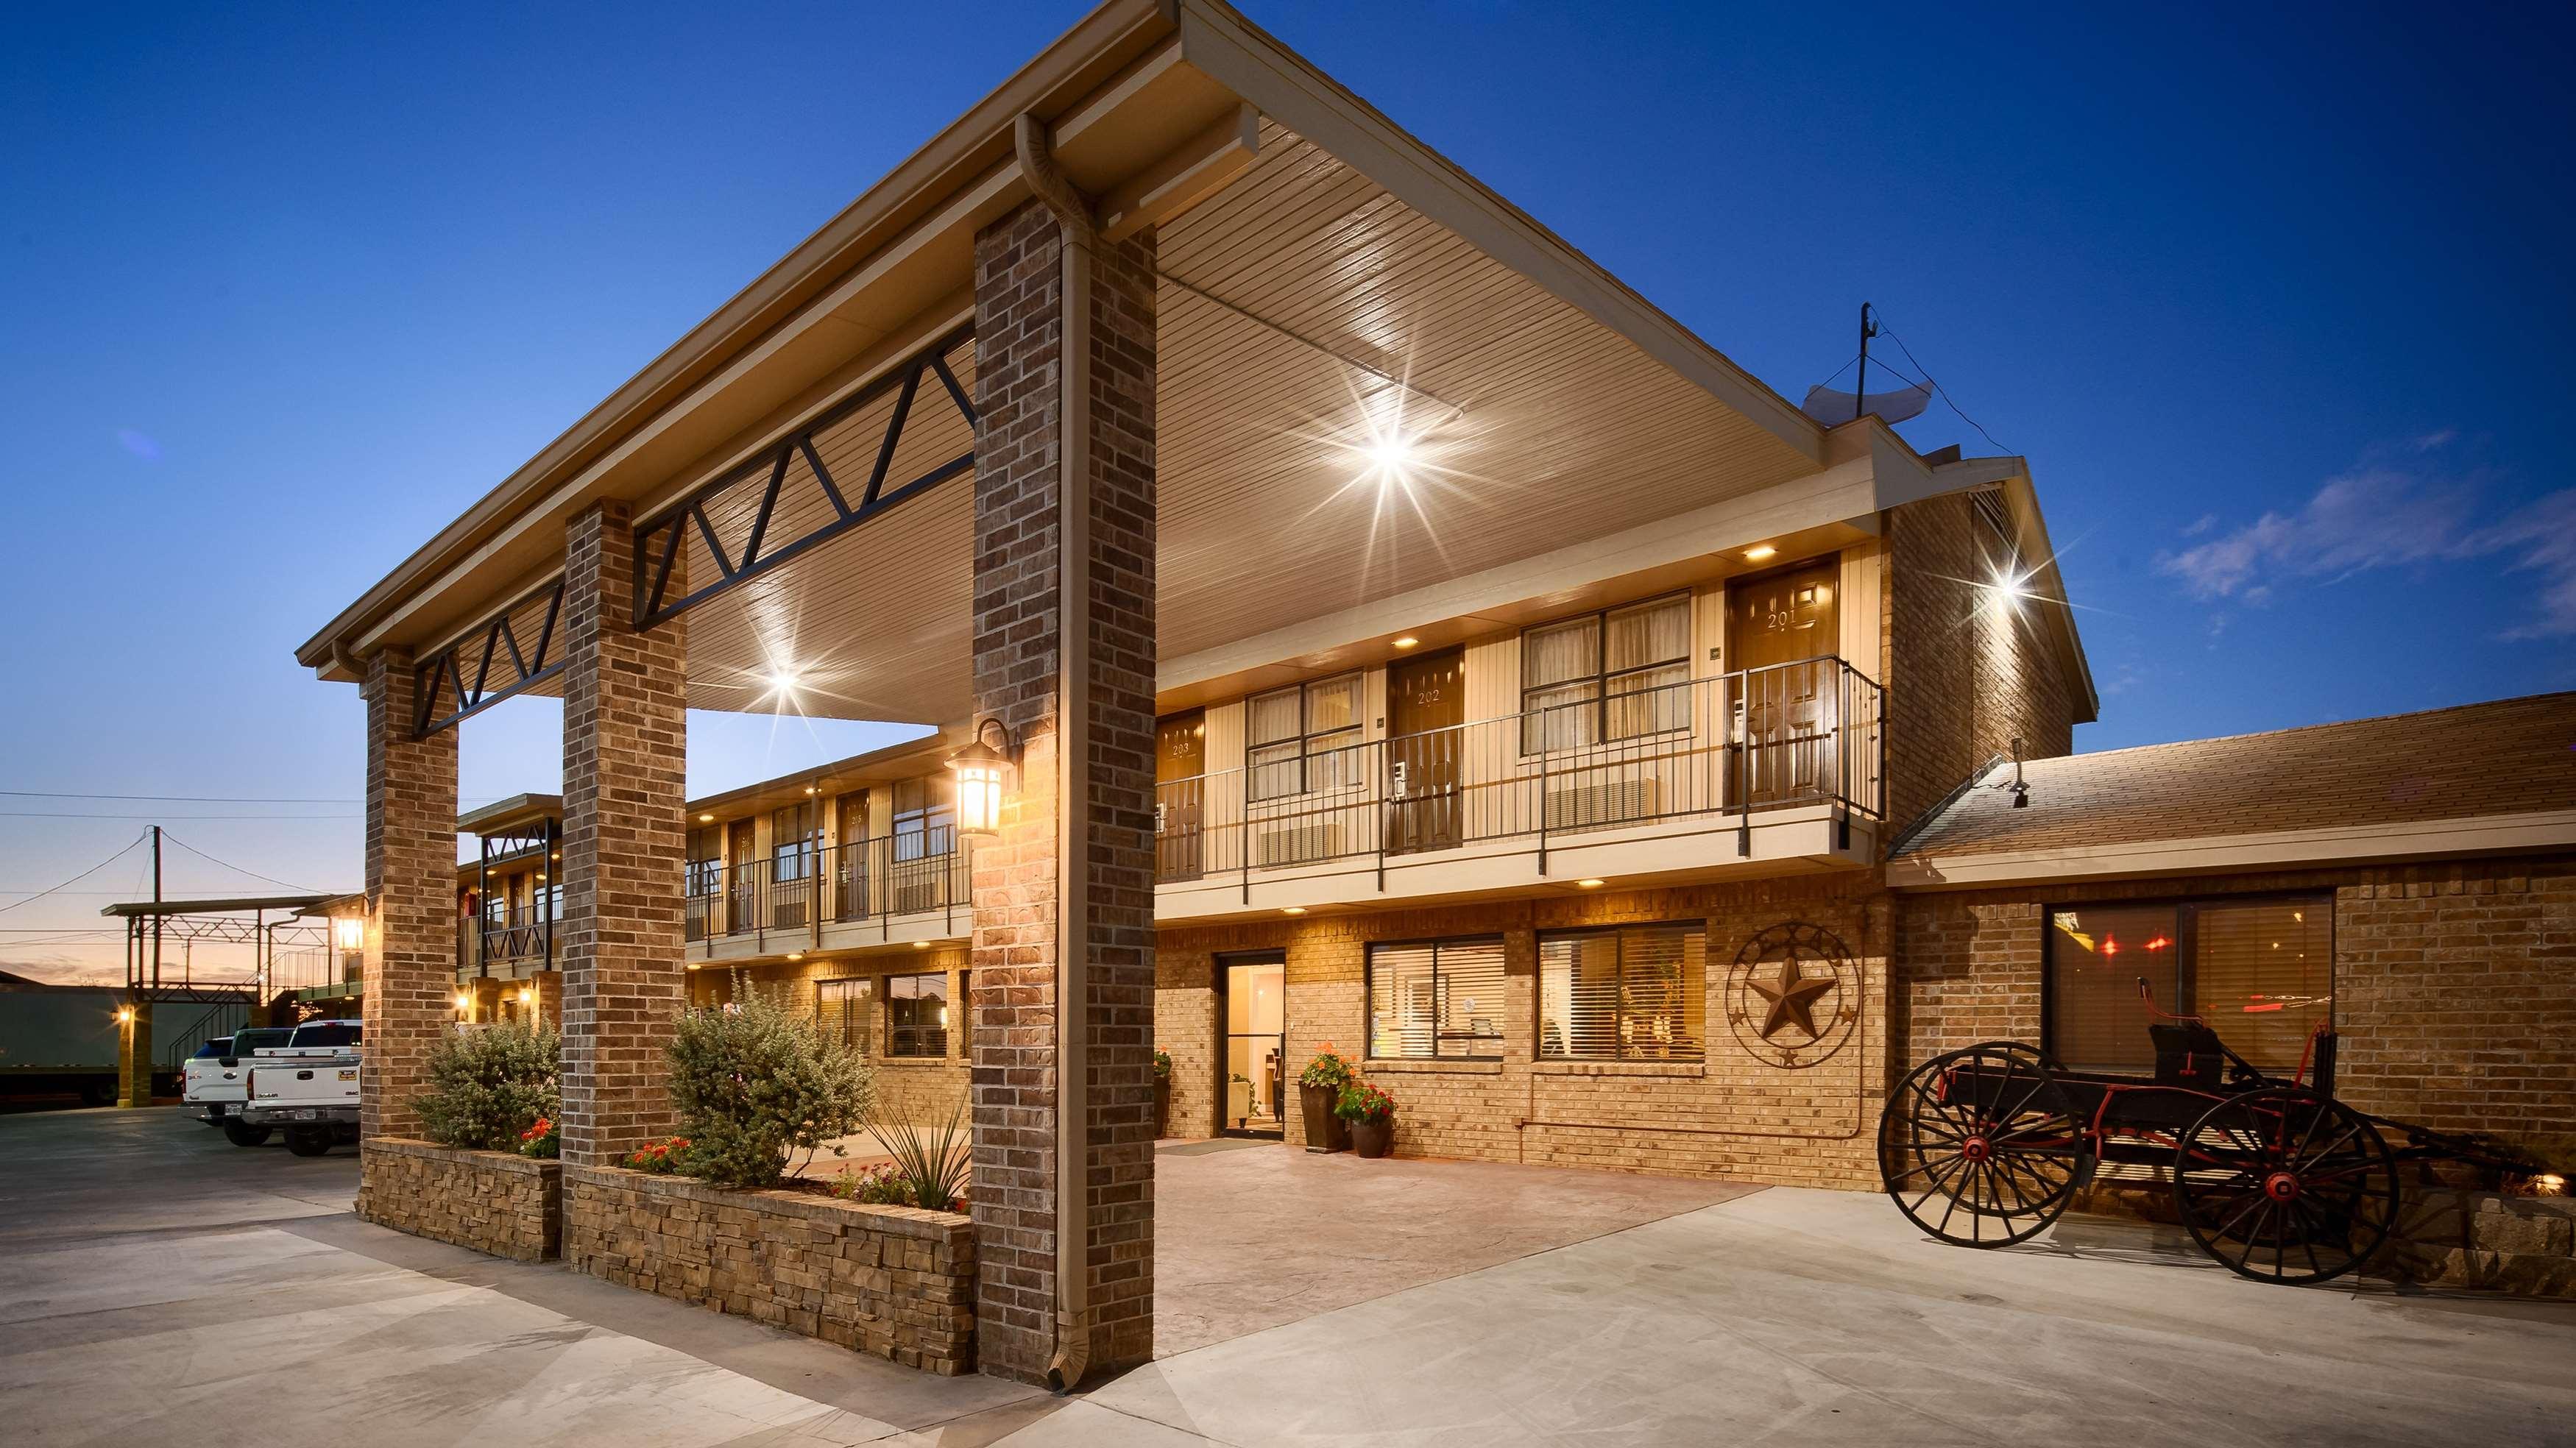 Best Western Caprock Inn image 1